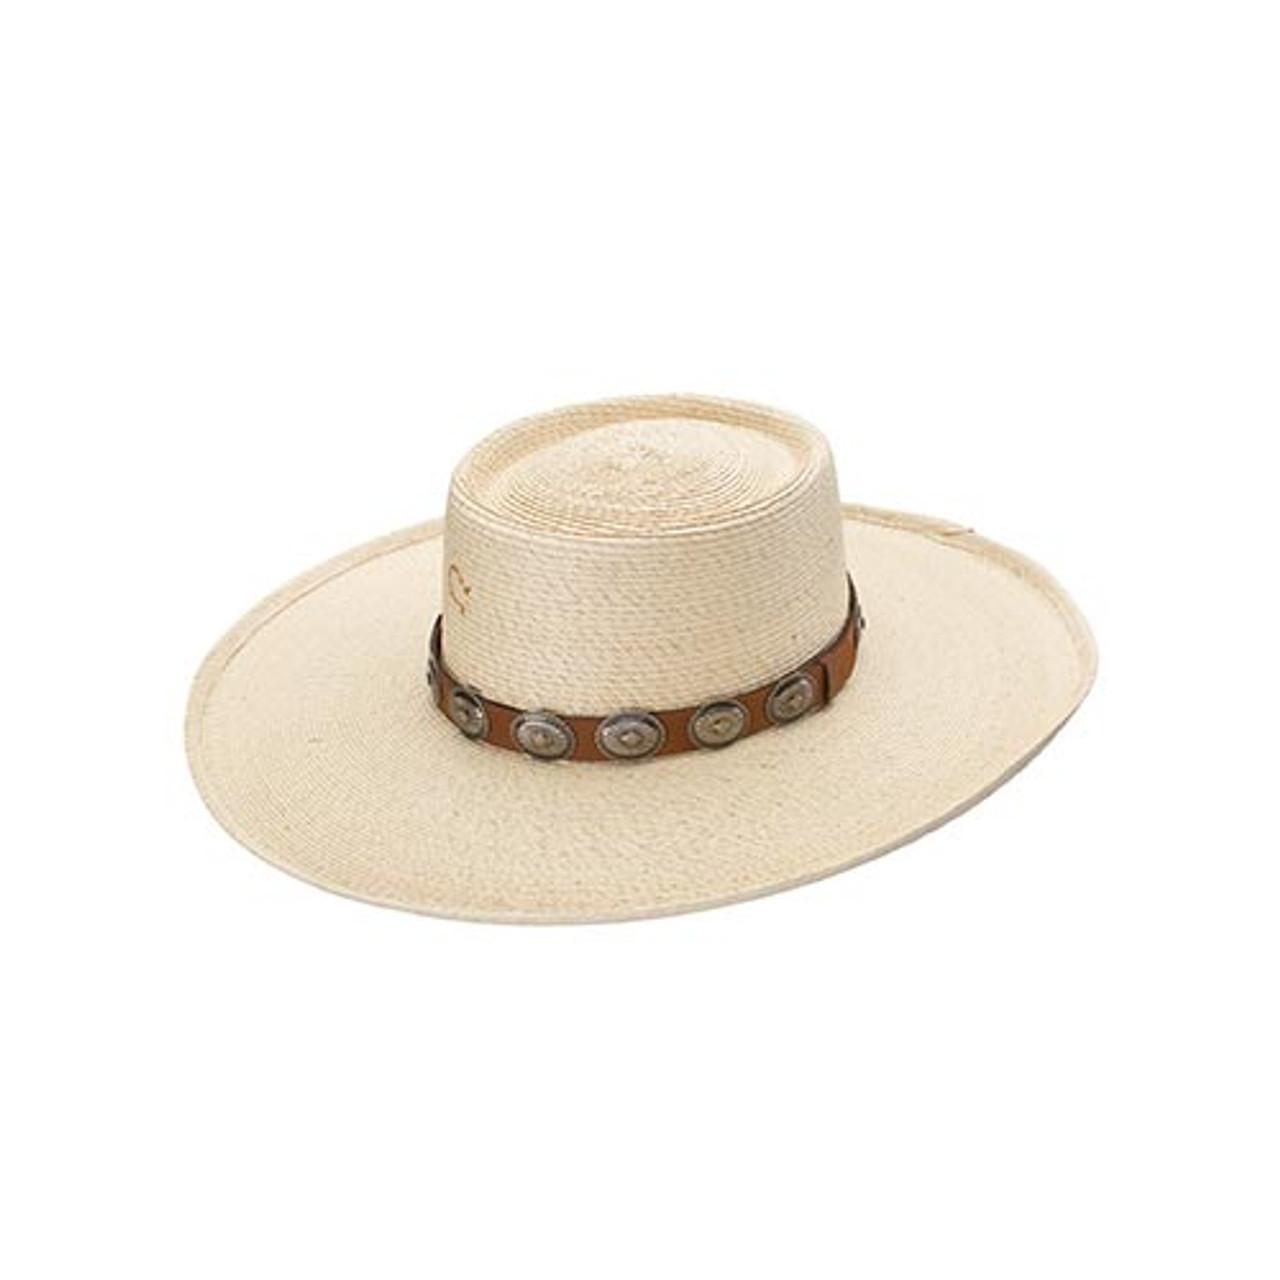 d3ede7940 Charlie 1 Horse Womens - High Desert Palm Straw Hat